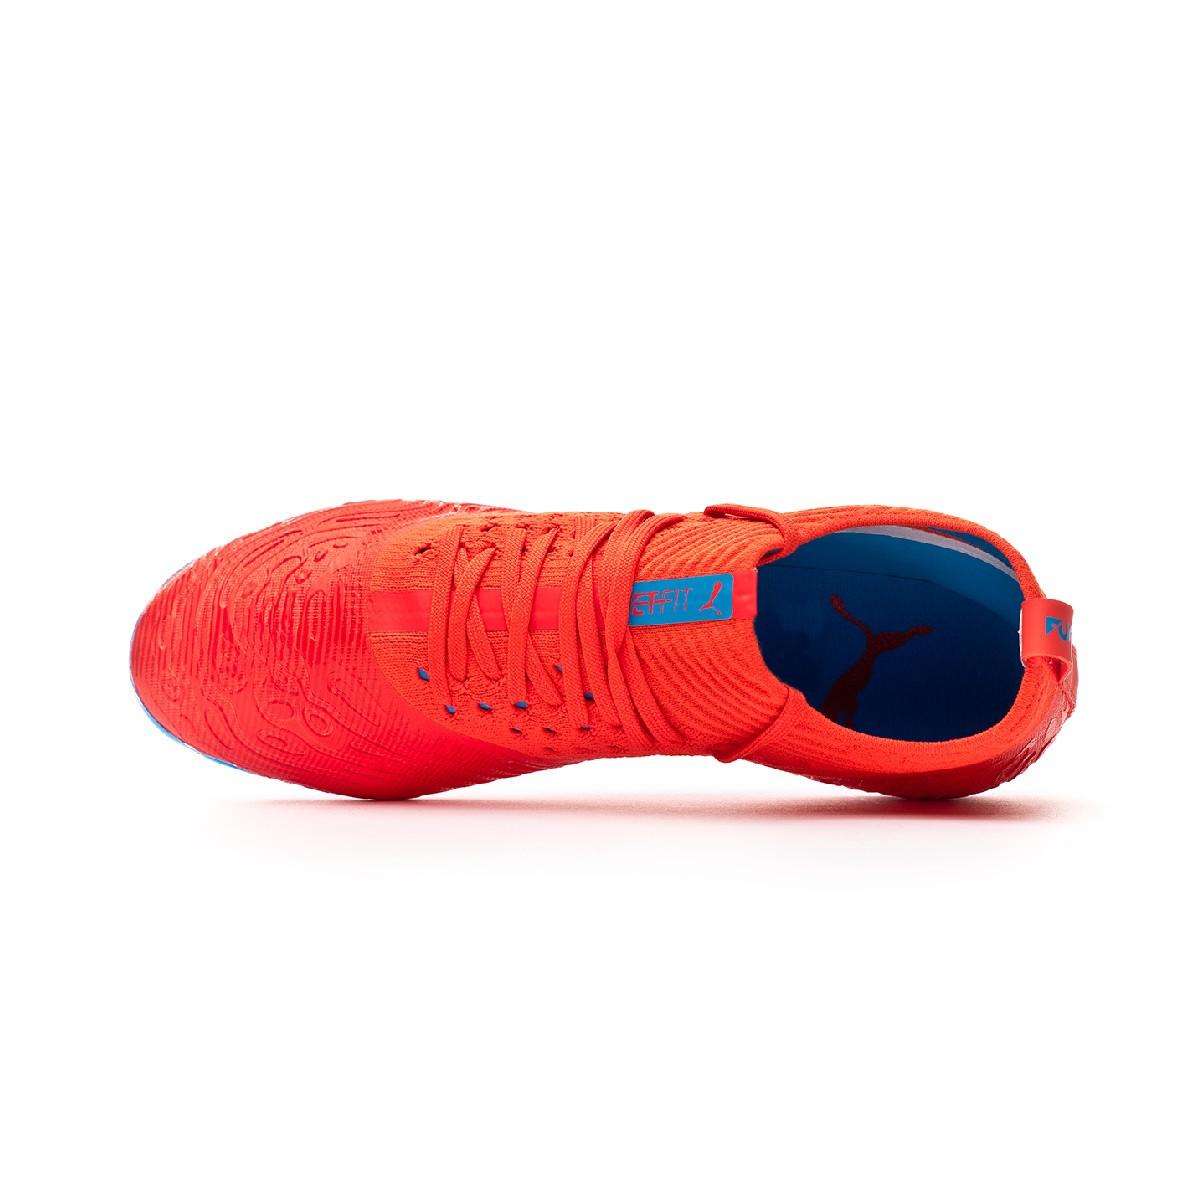 Bota Future 19.2 Netfit MG Red blast Bleu azur